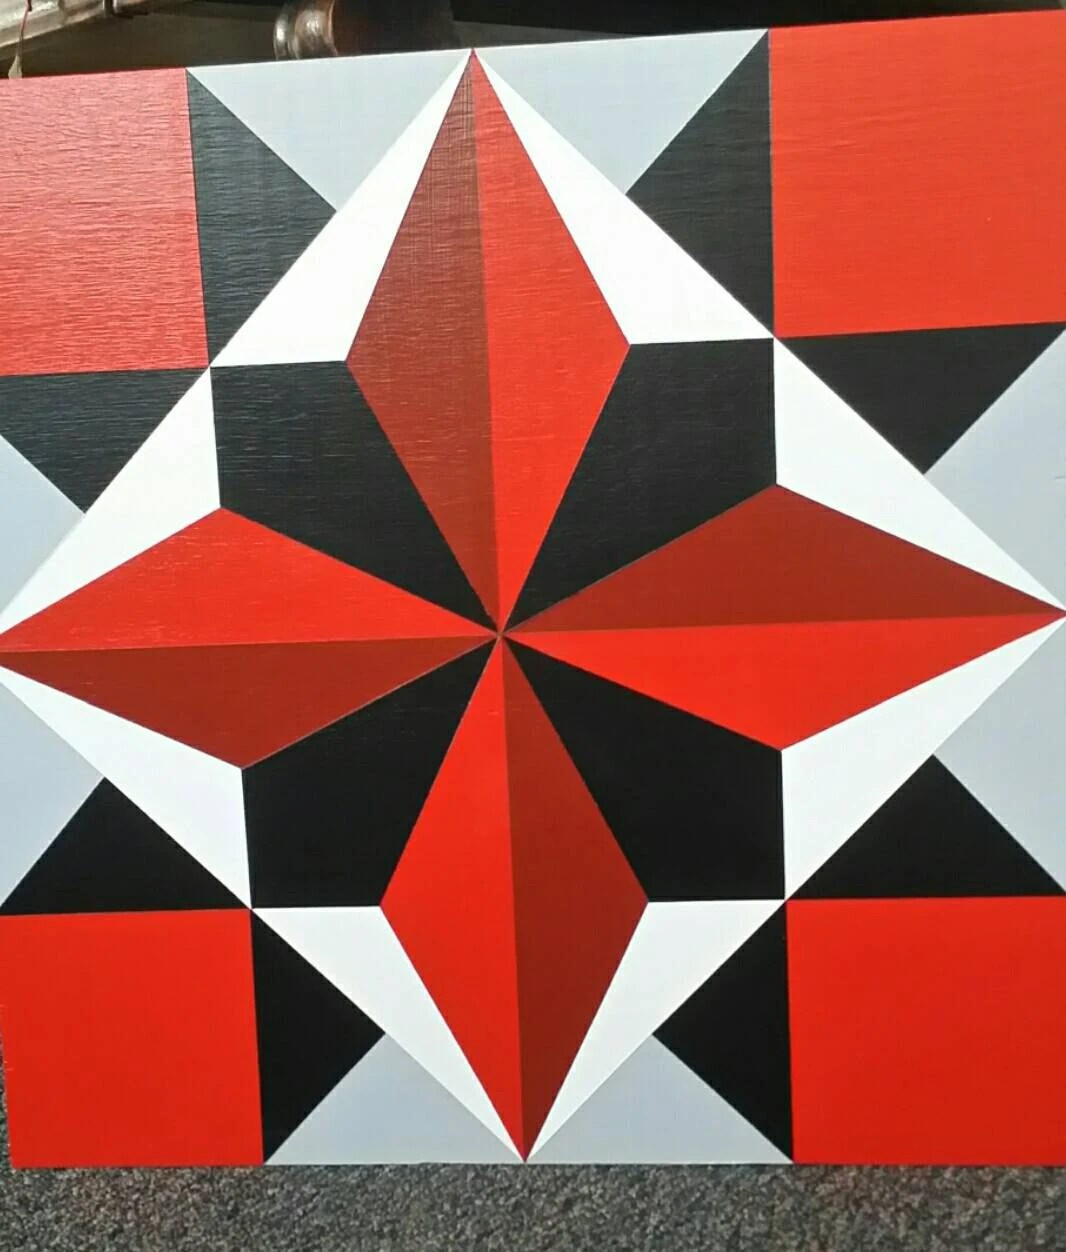 Carpenters Wheel Quilt Pattern Template